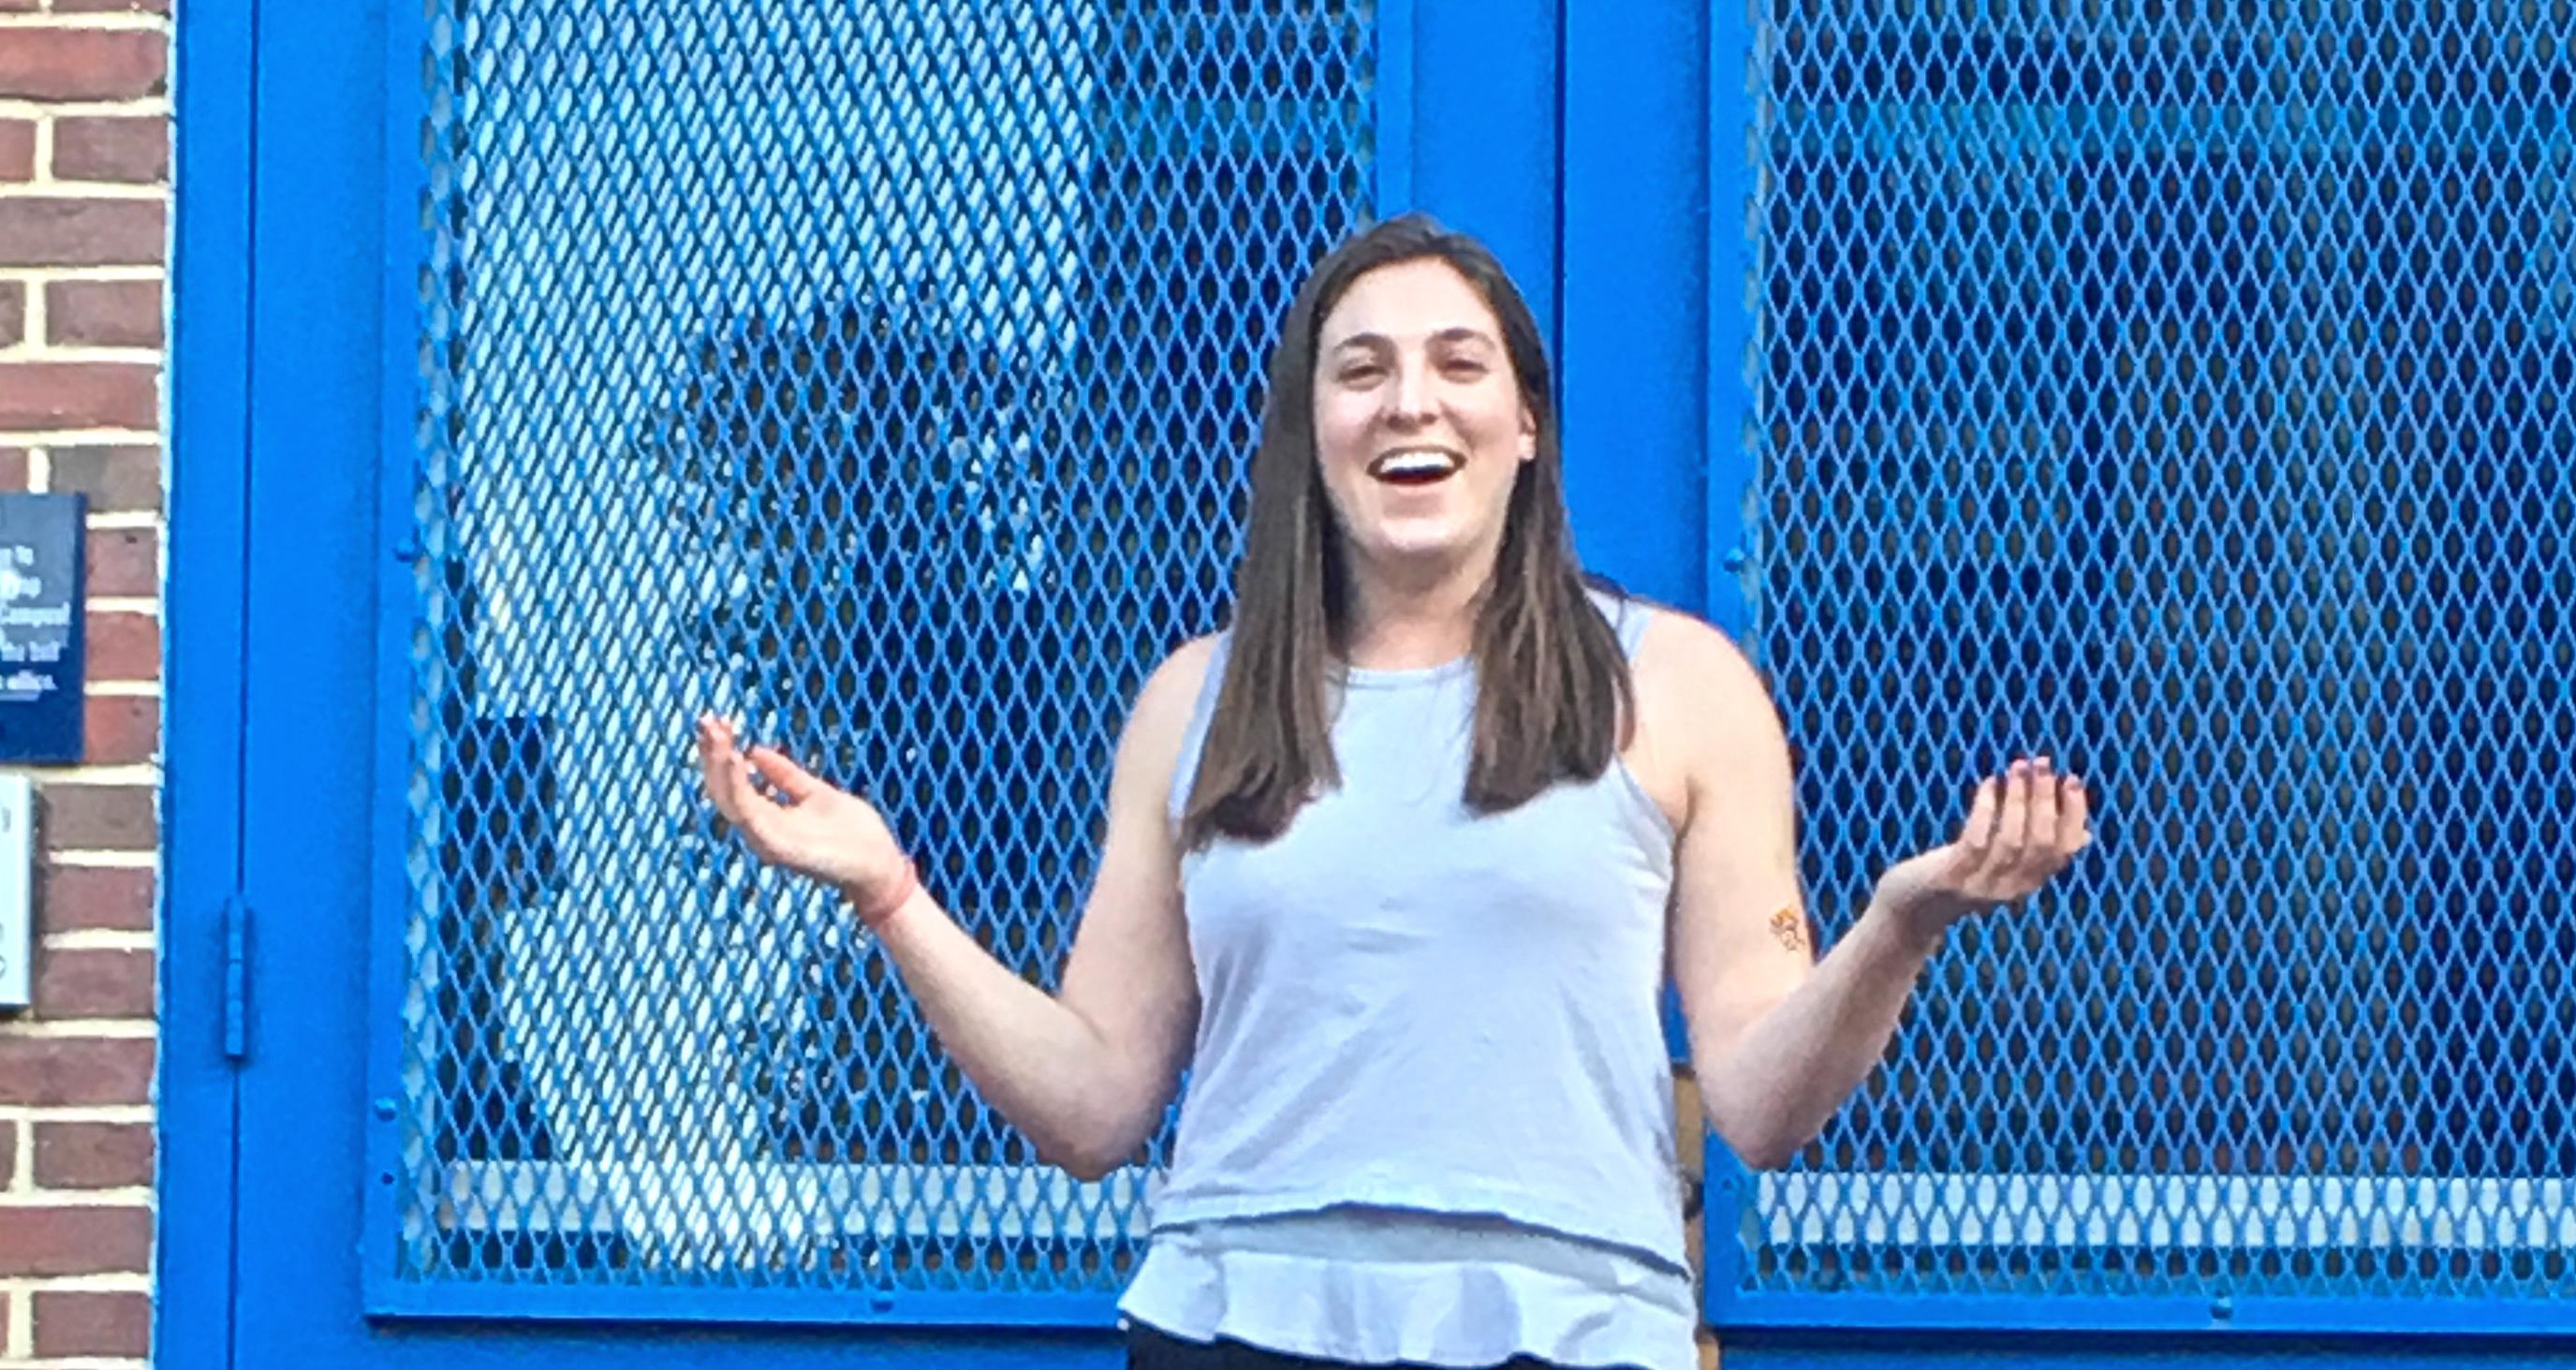 Haley Goodman